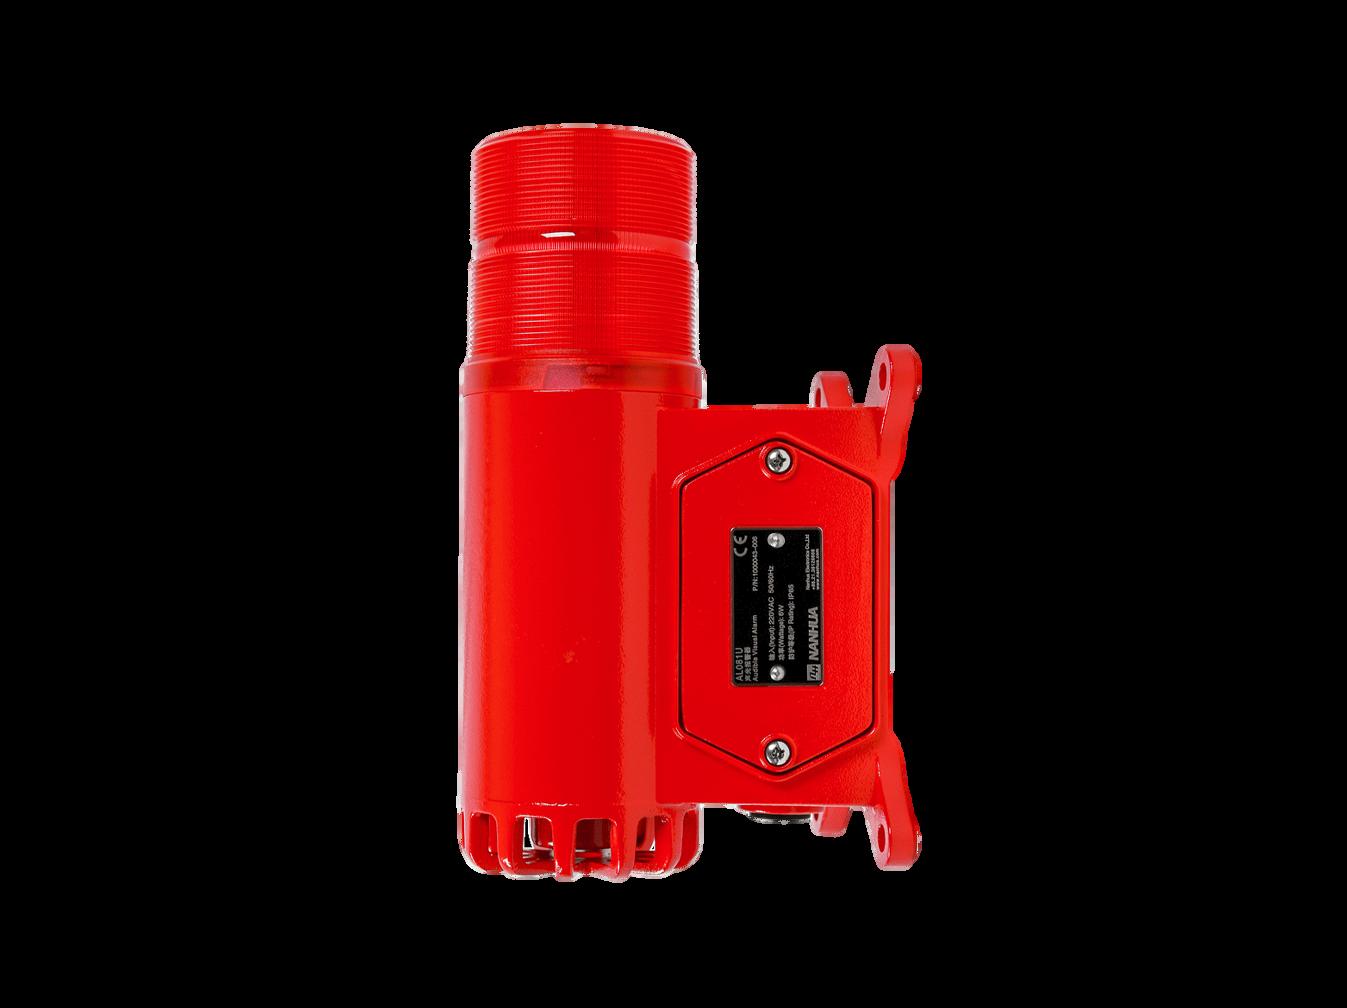 BC-8 Lichtbaken met Sirene